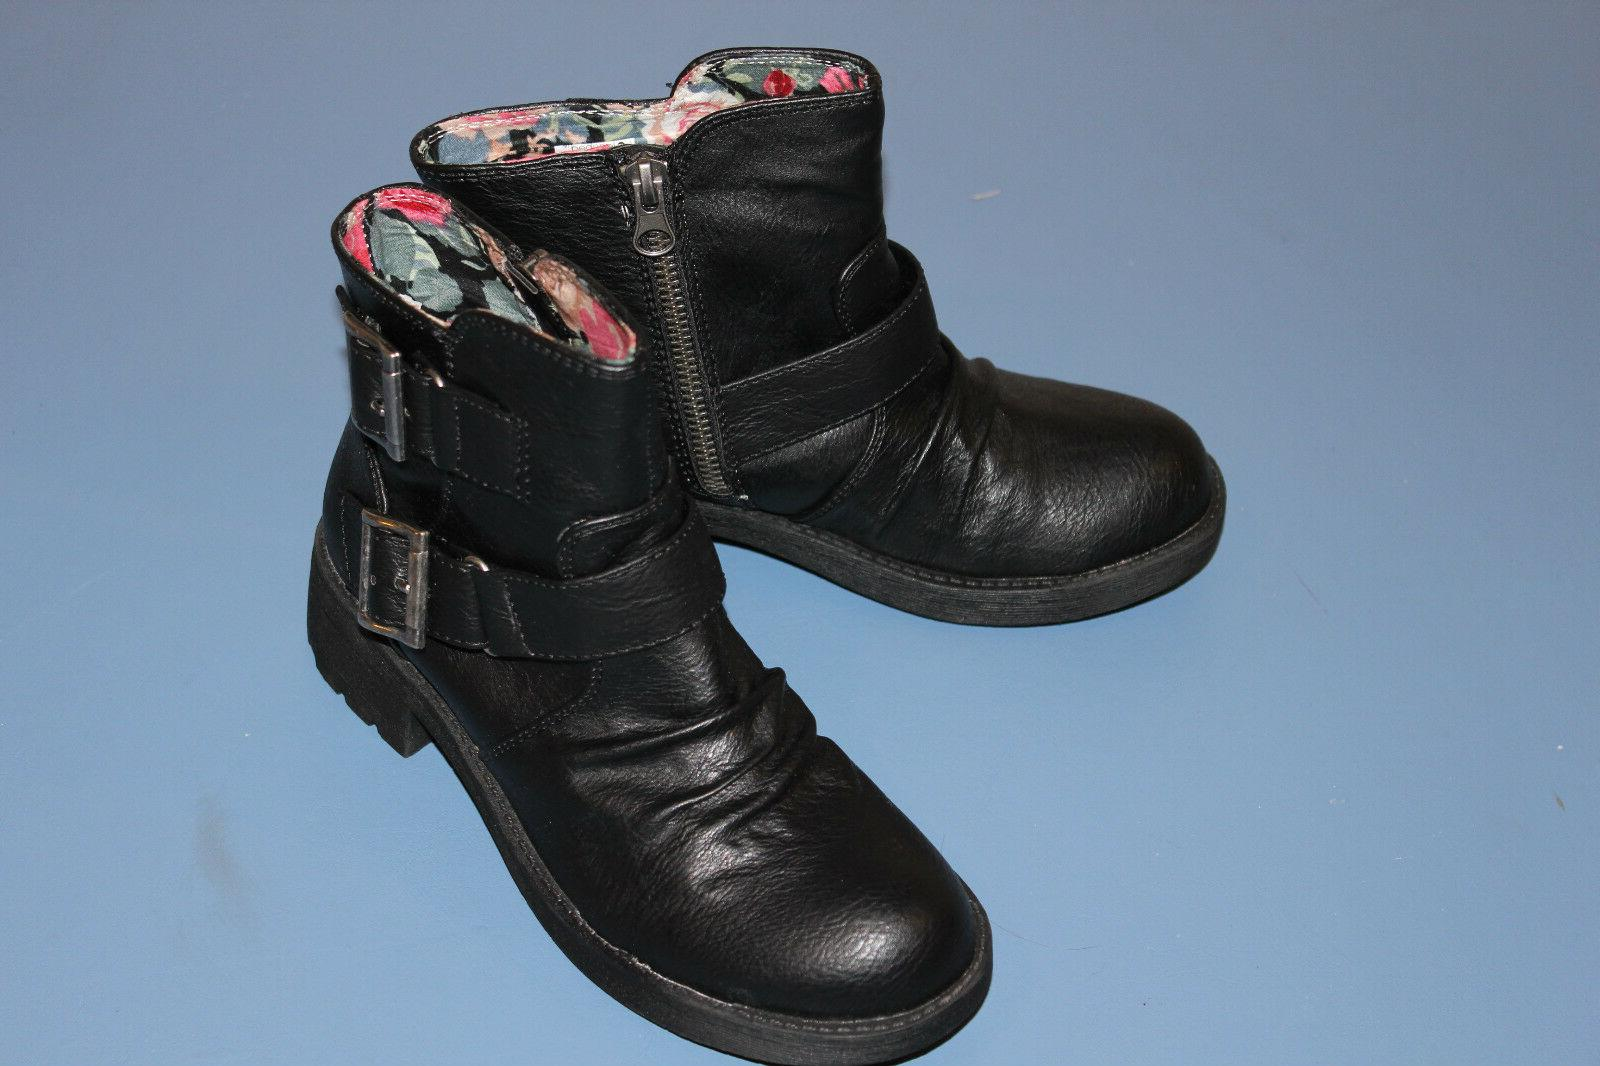 RocketDog Style BOOTS TRACKS SZ New Box